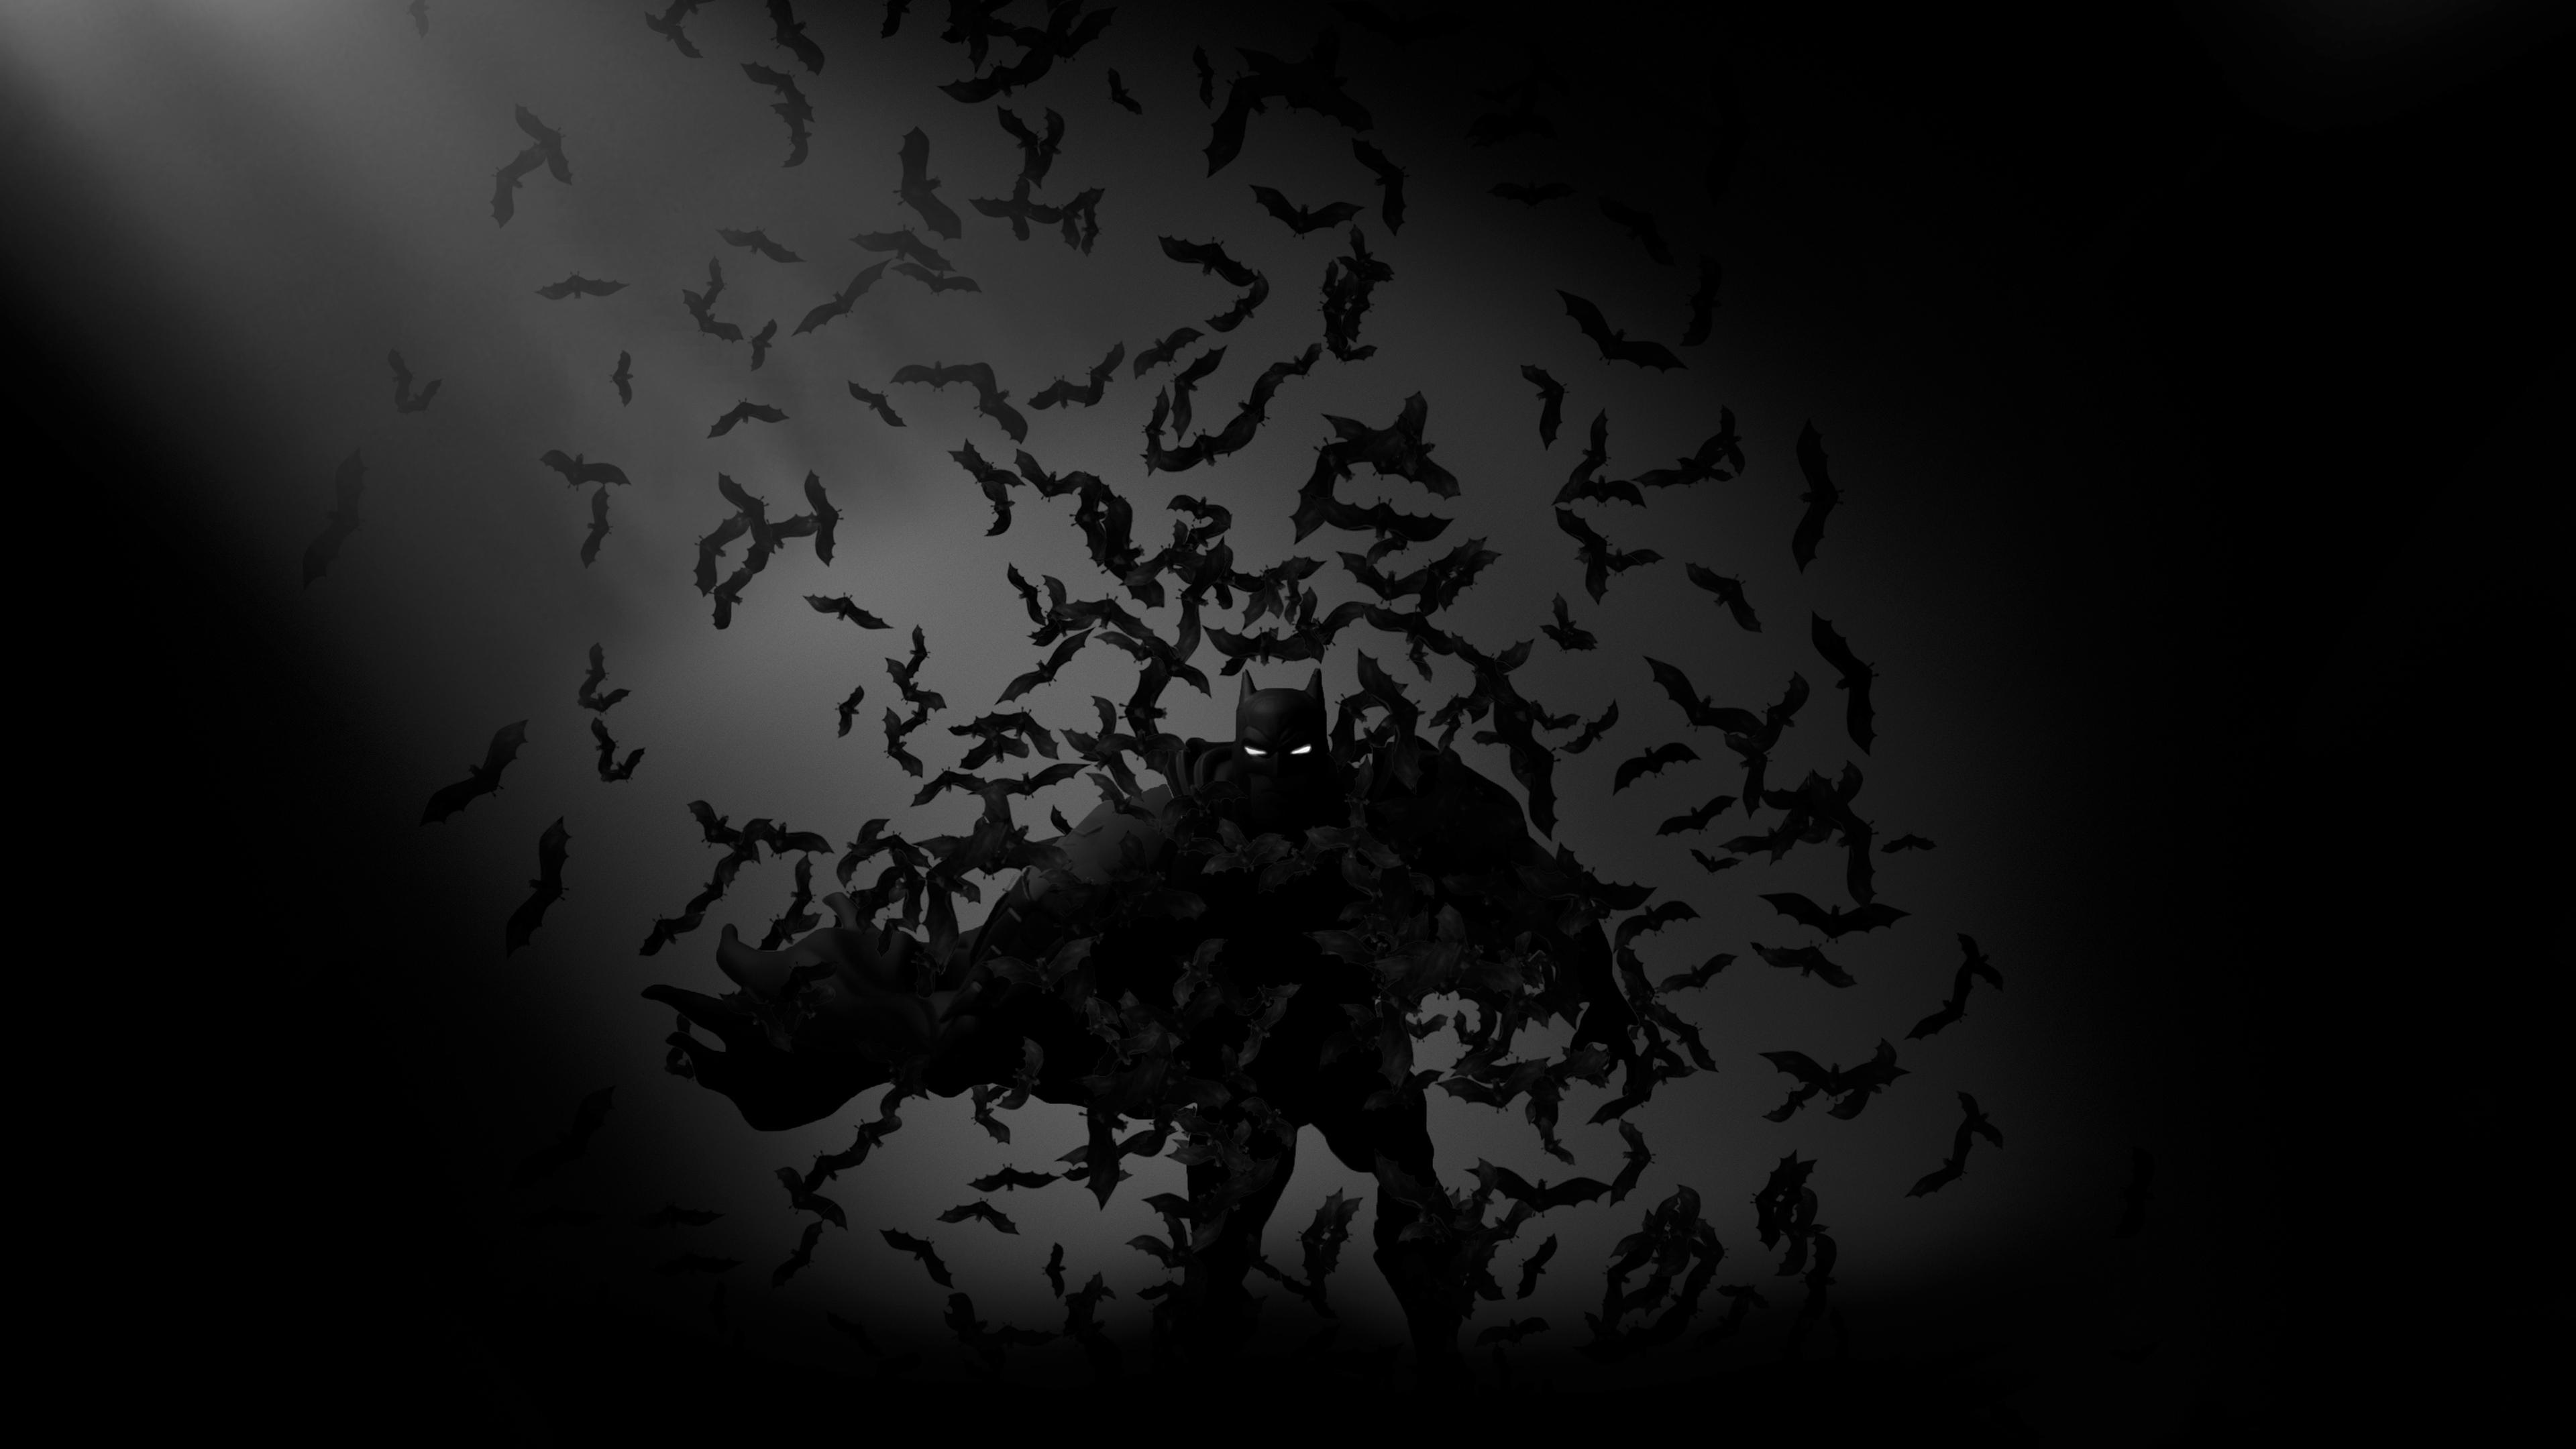 Wallpaper 4k Batman Bats Art 4k 4k Wallpapers Batman Wallpapers